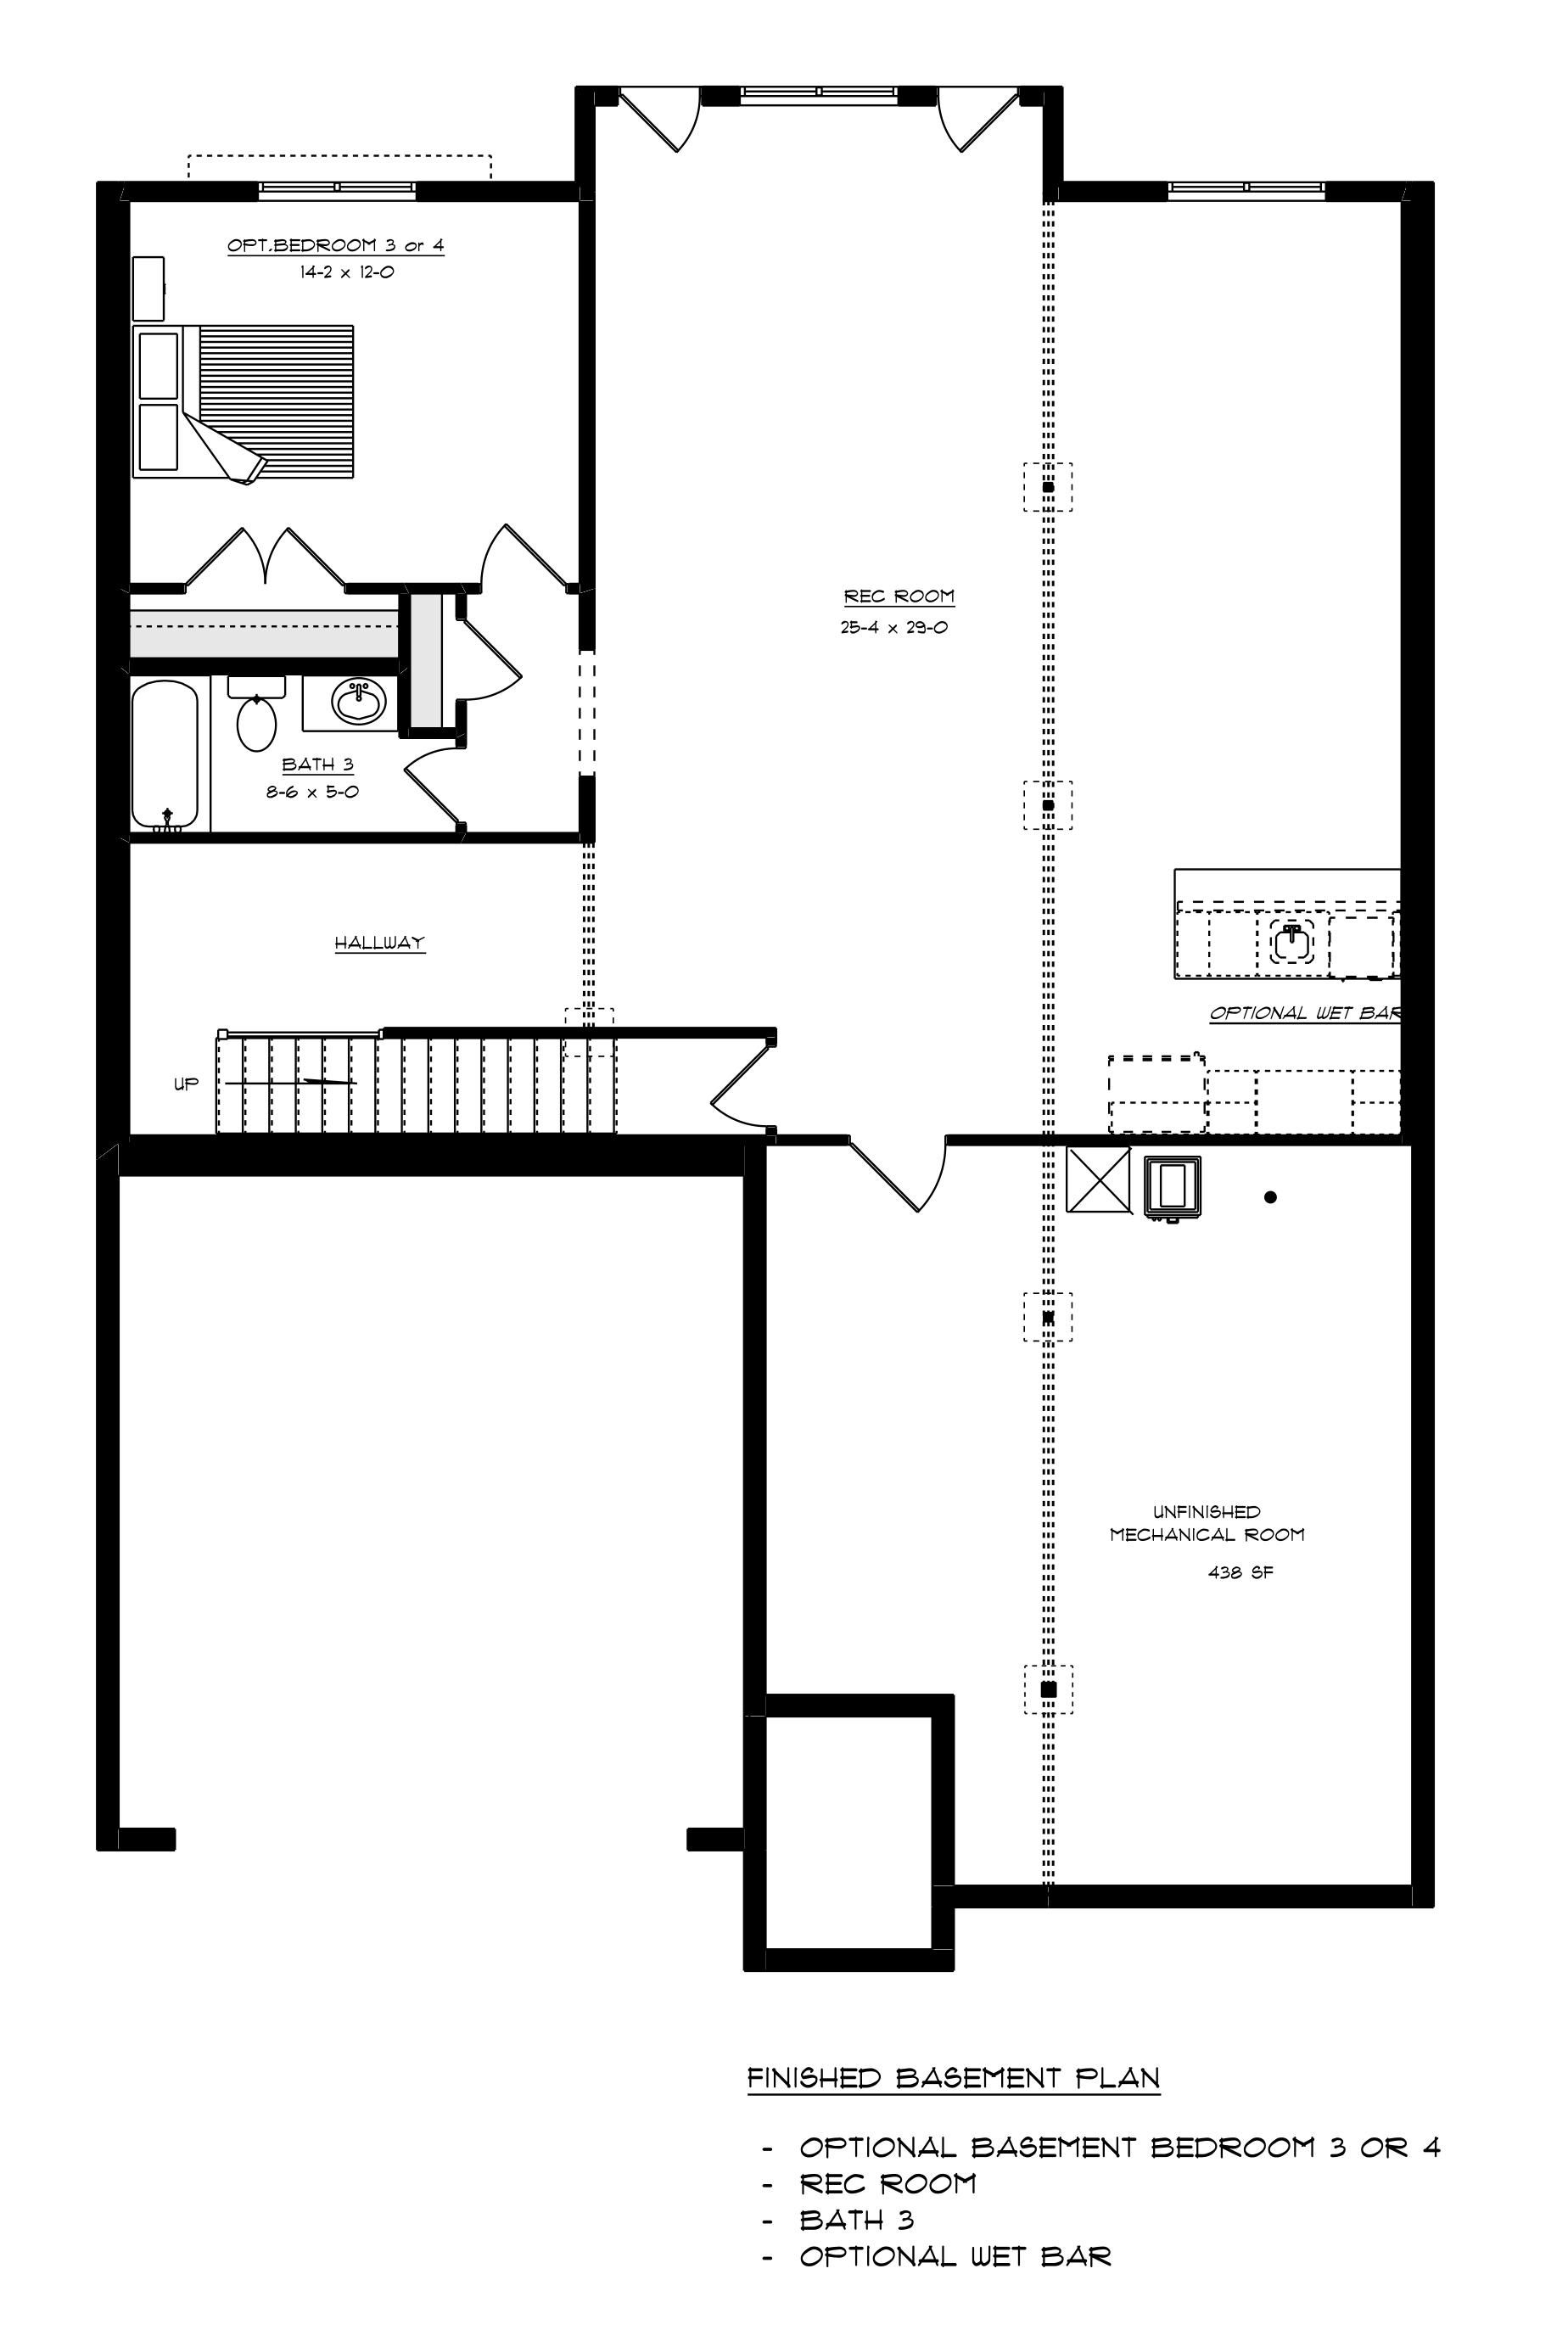 Pavilion Optional Finished Basement with 1 Bedroom